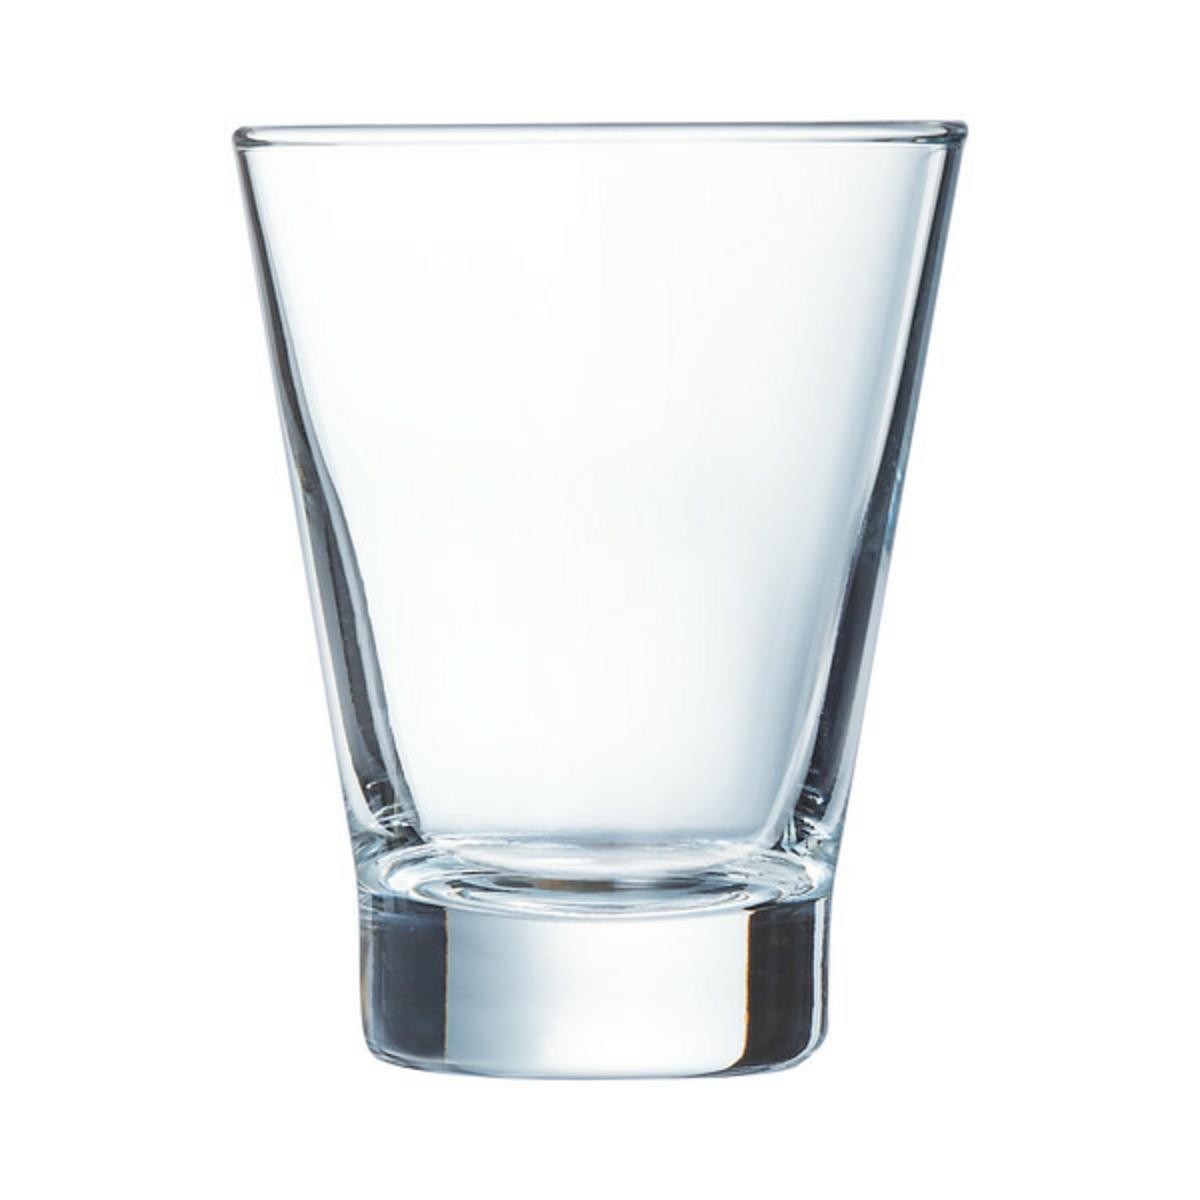 Verrine conique transparente verre 9 cl Ø 6 cm Shetland Arcoroc